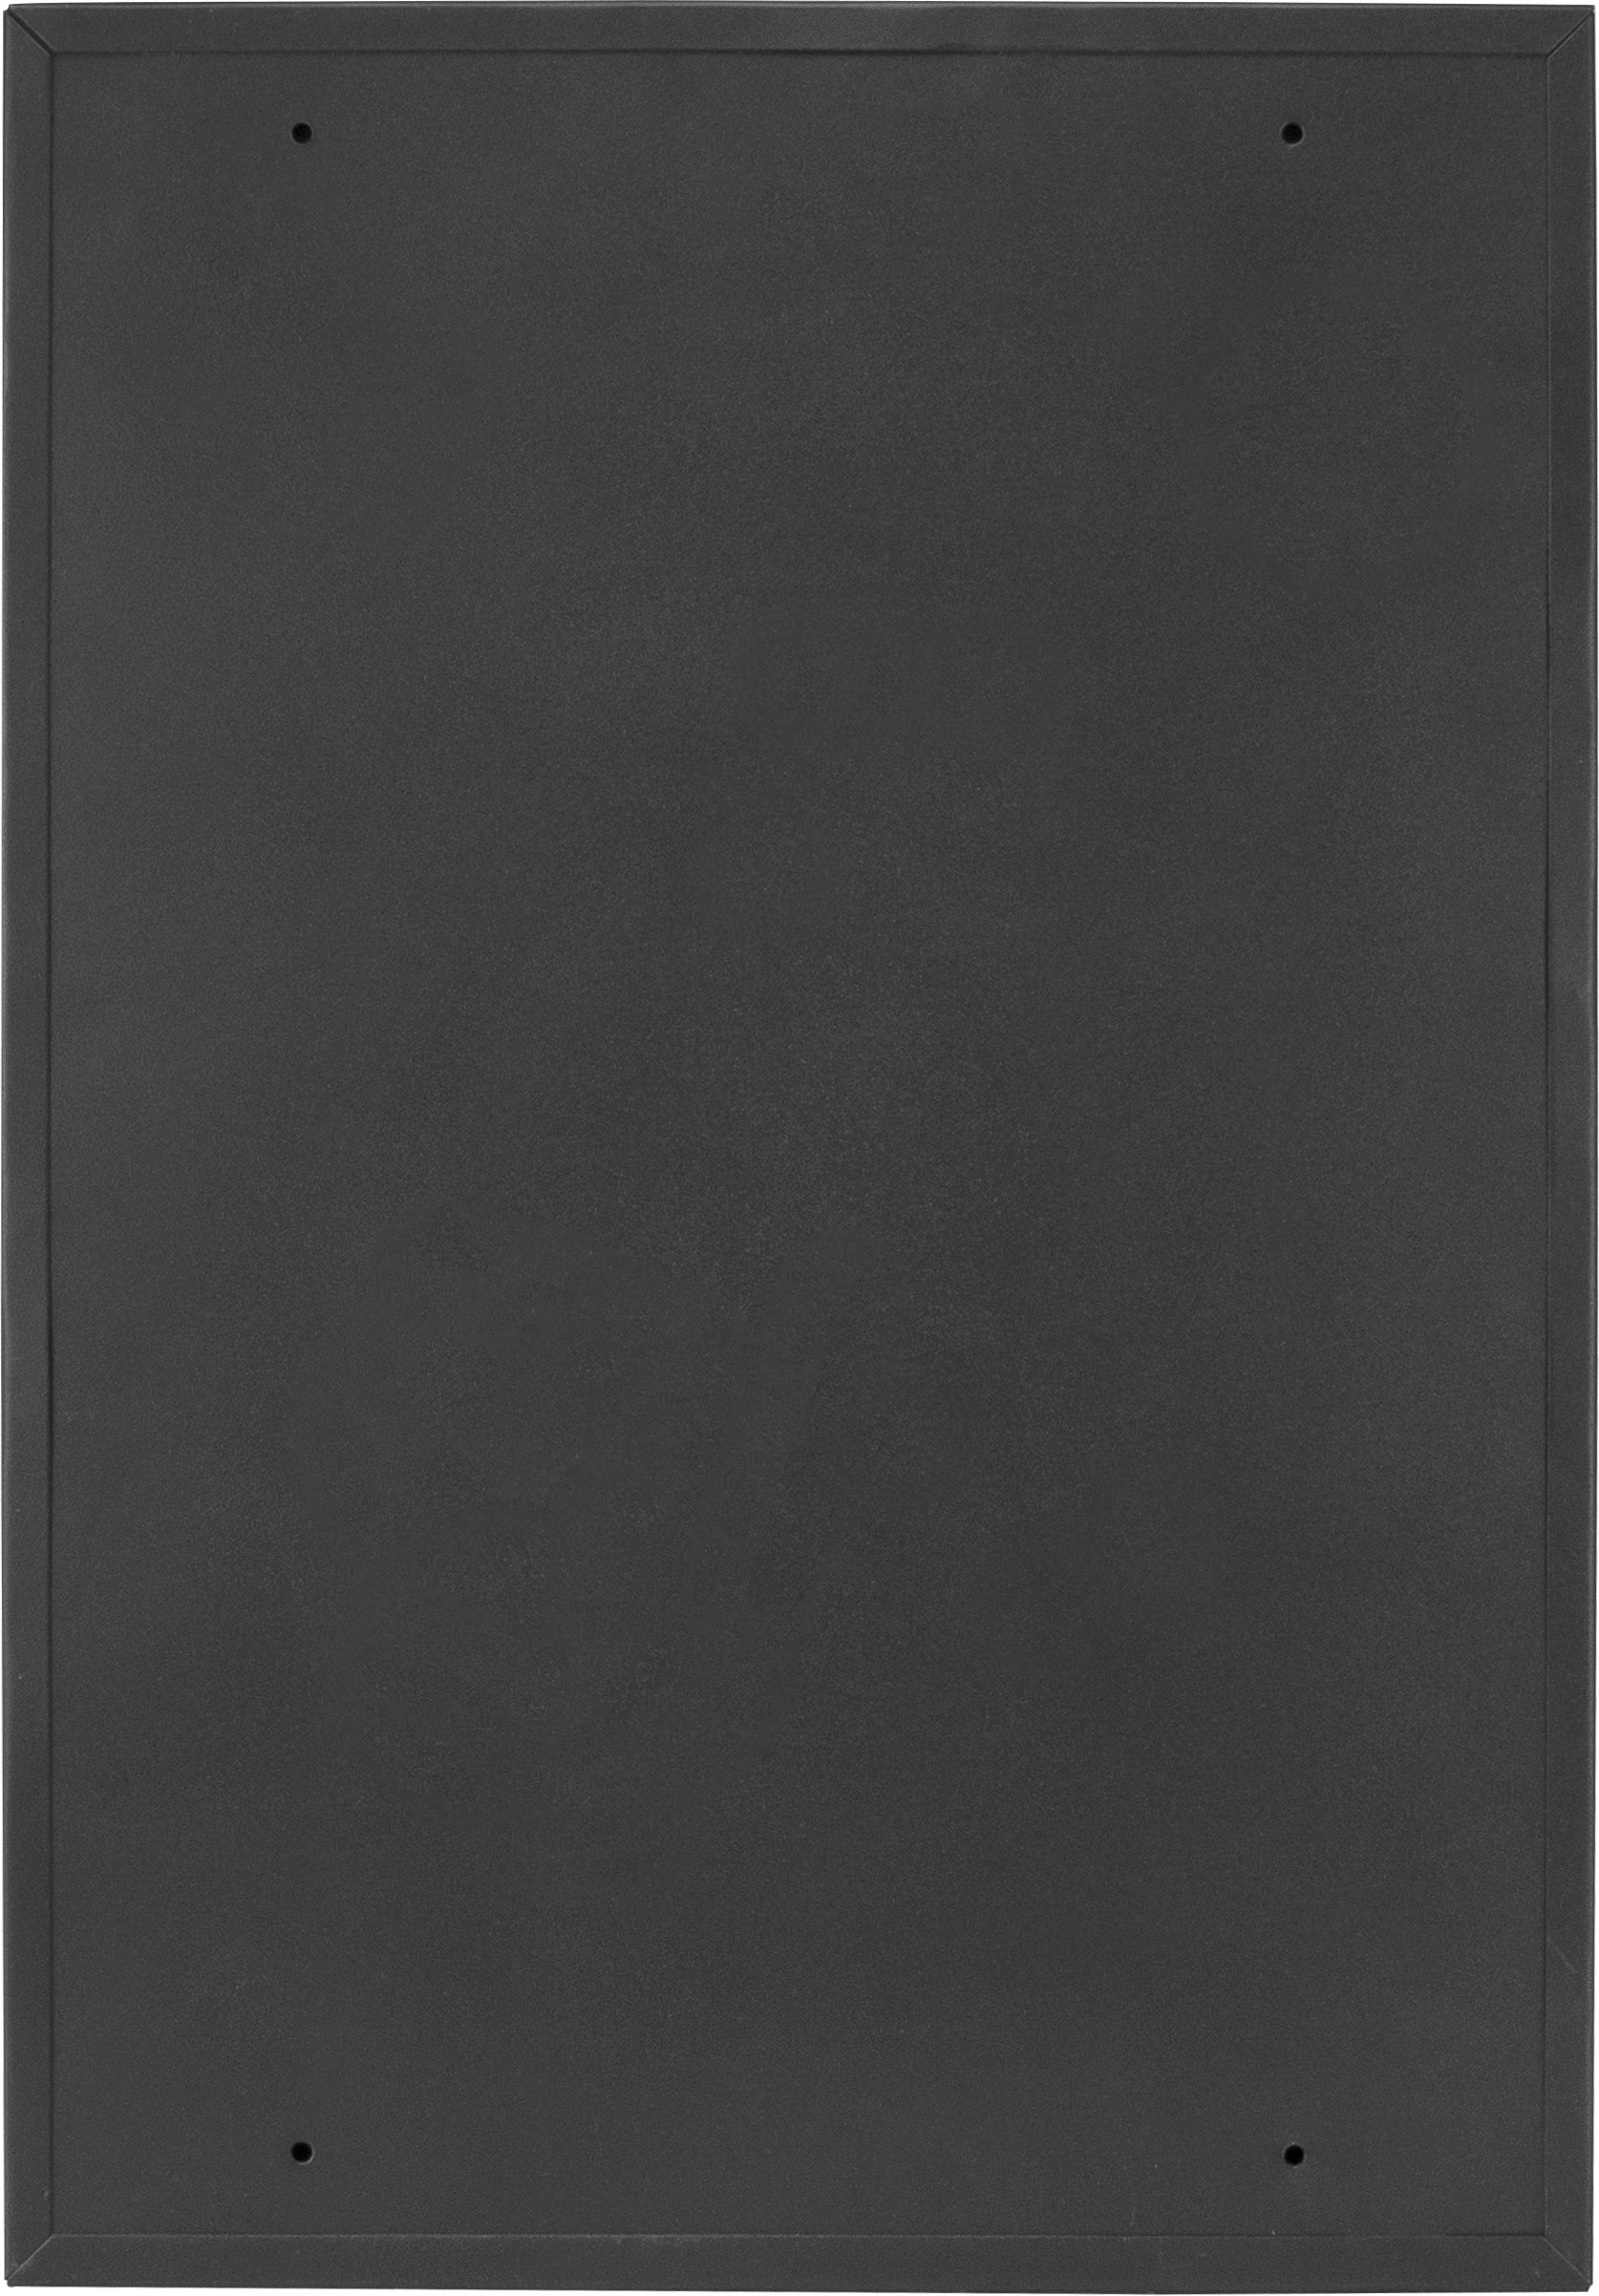 Barska 100 Position Key Cabinet with Key Lock, Black by BARSKA (Image #5)